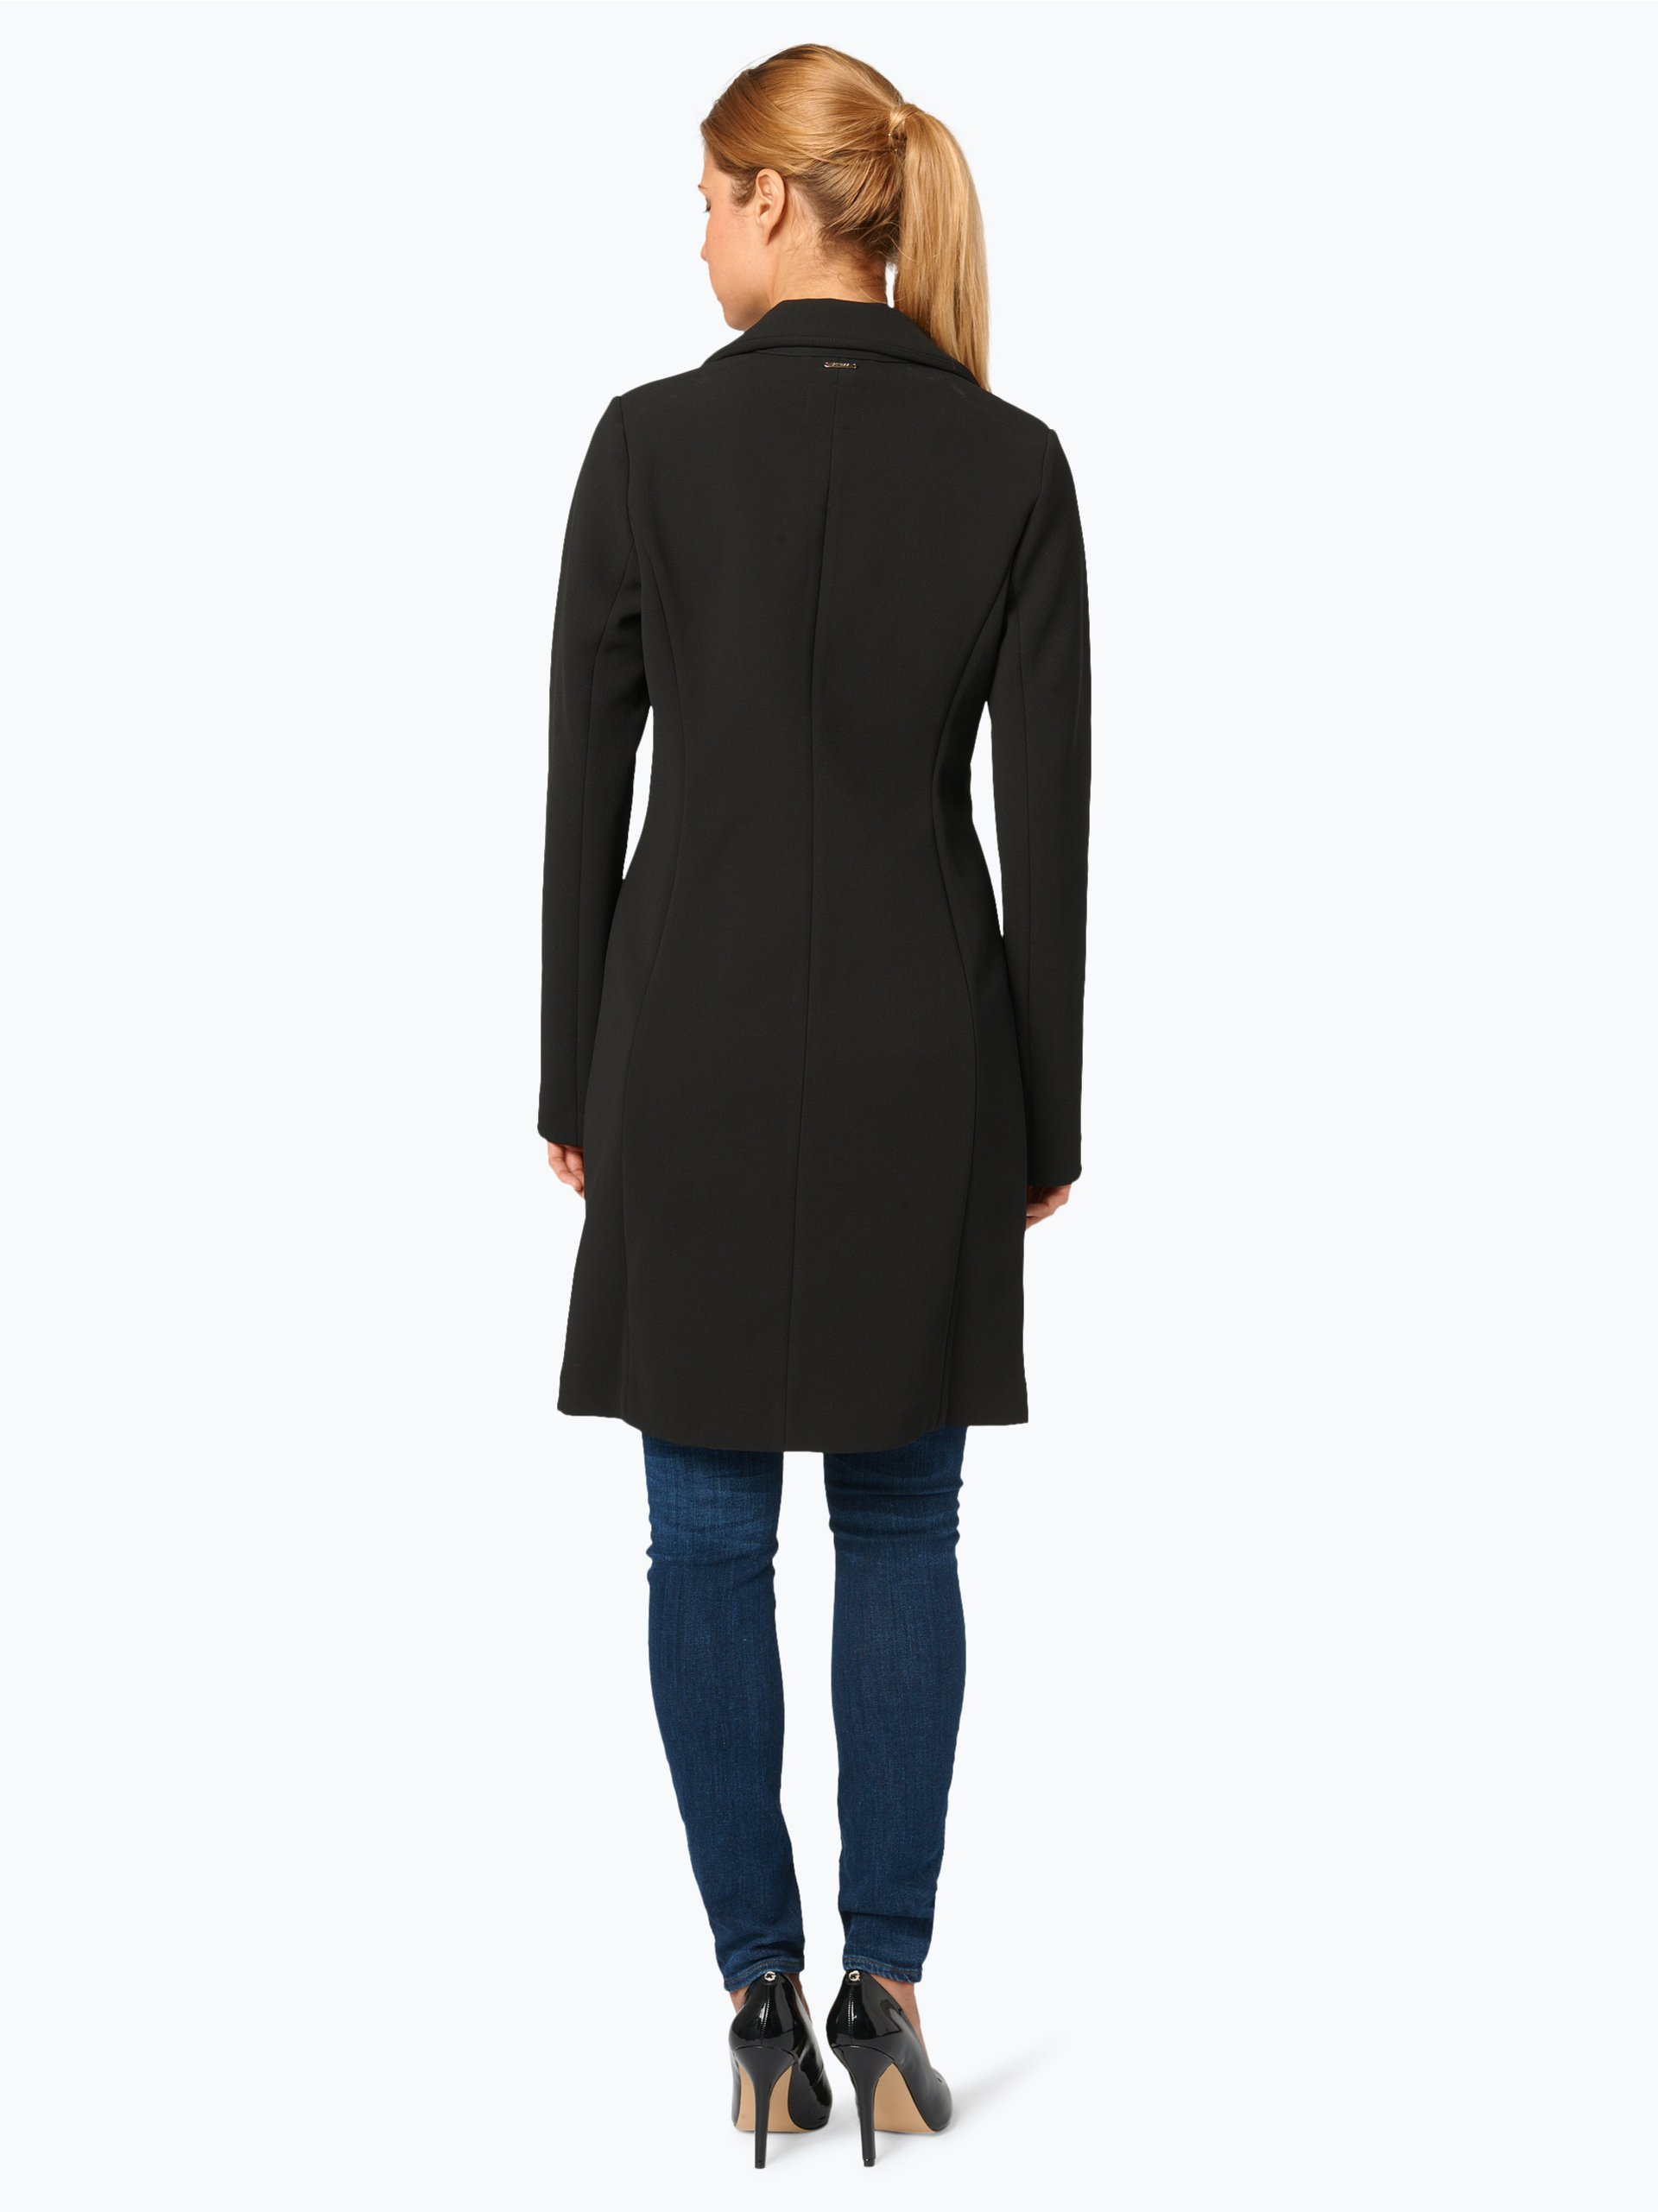 guess jeans damen mantel schwarz uni online kaufen peek. Black Bedroom Furniture Sets. Home Design Ideas